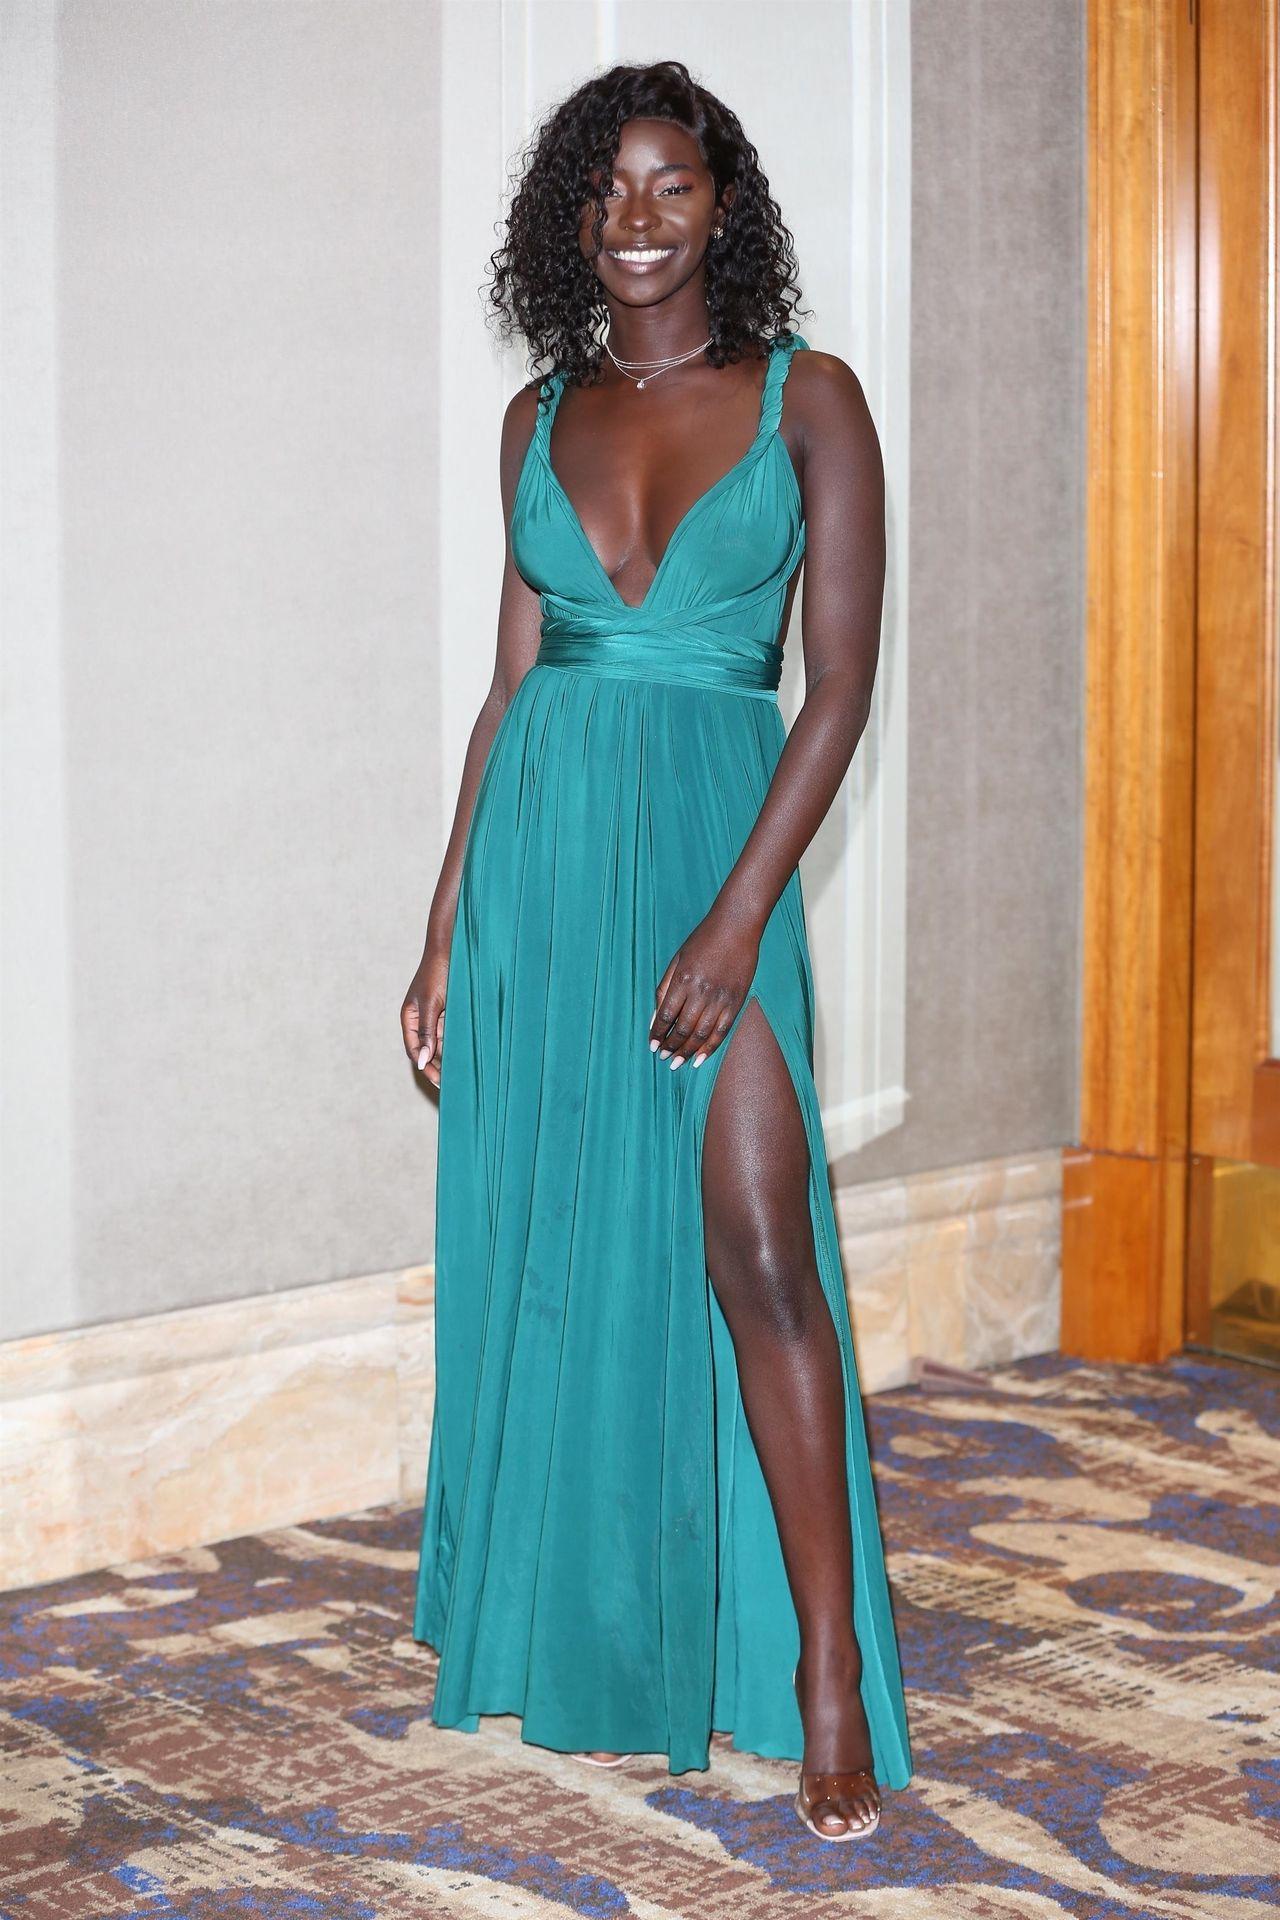 Mike Boateng & Priscilla Anyabu Are Seen At British Ethnic Diversity Sports Awards 0158